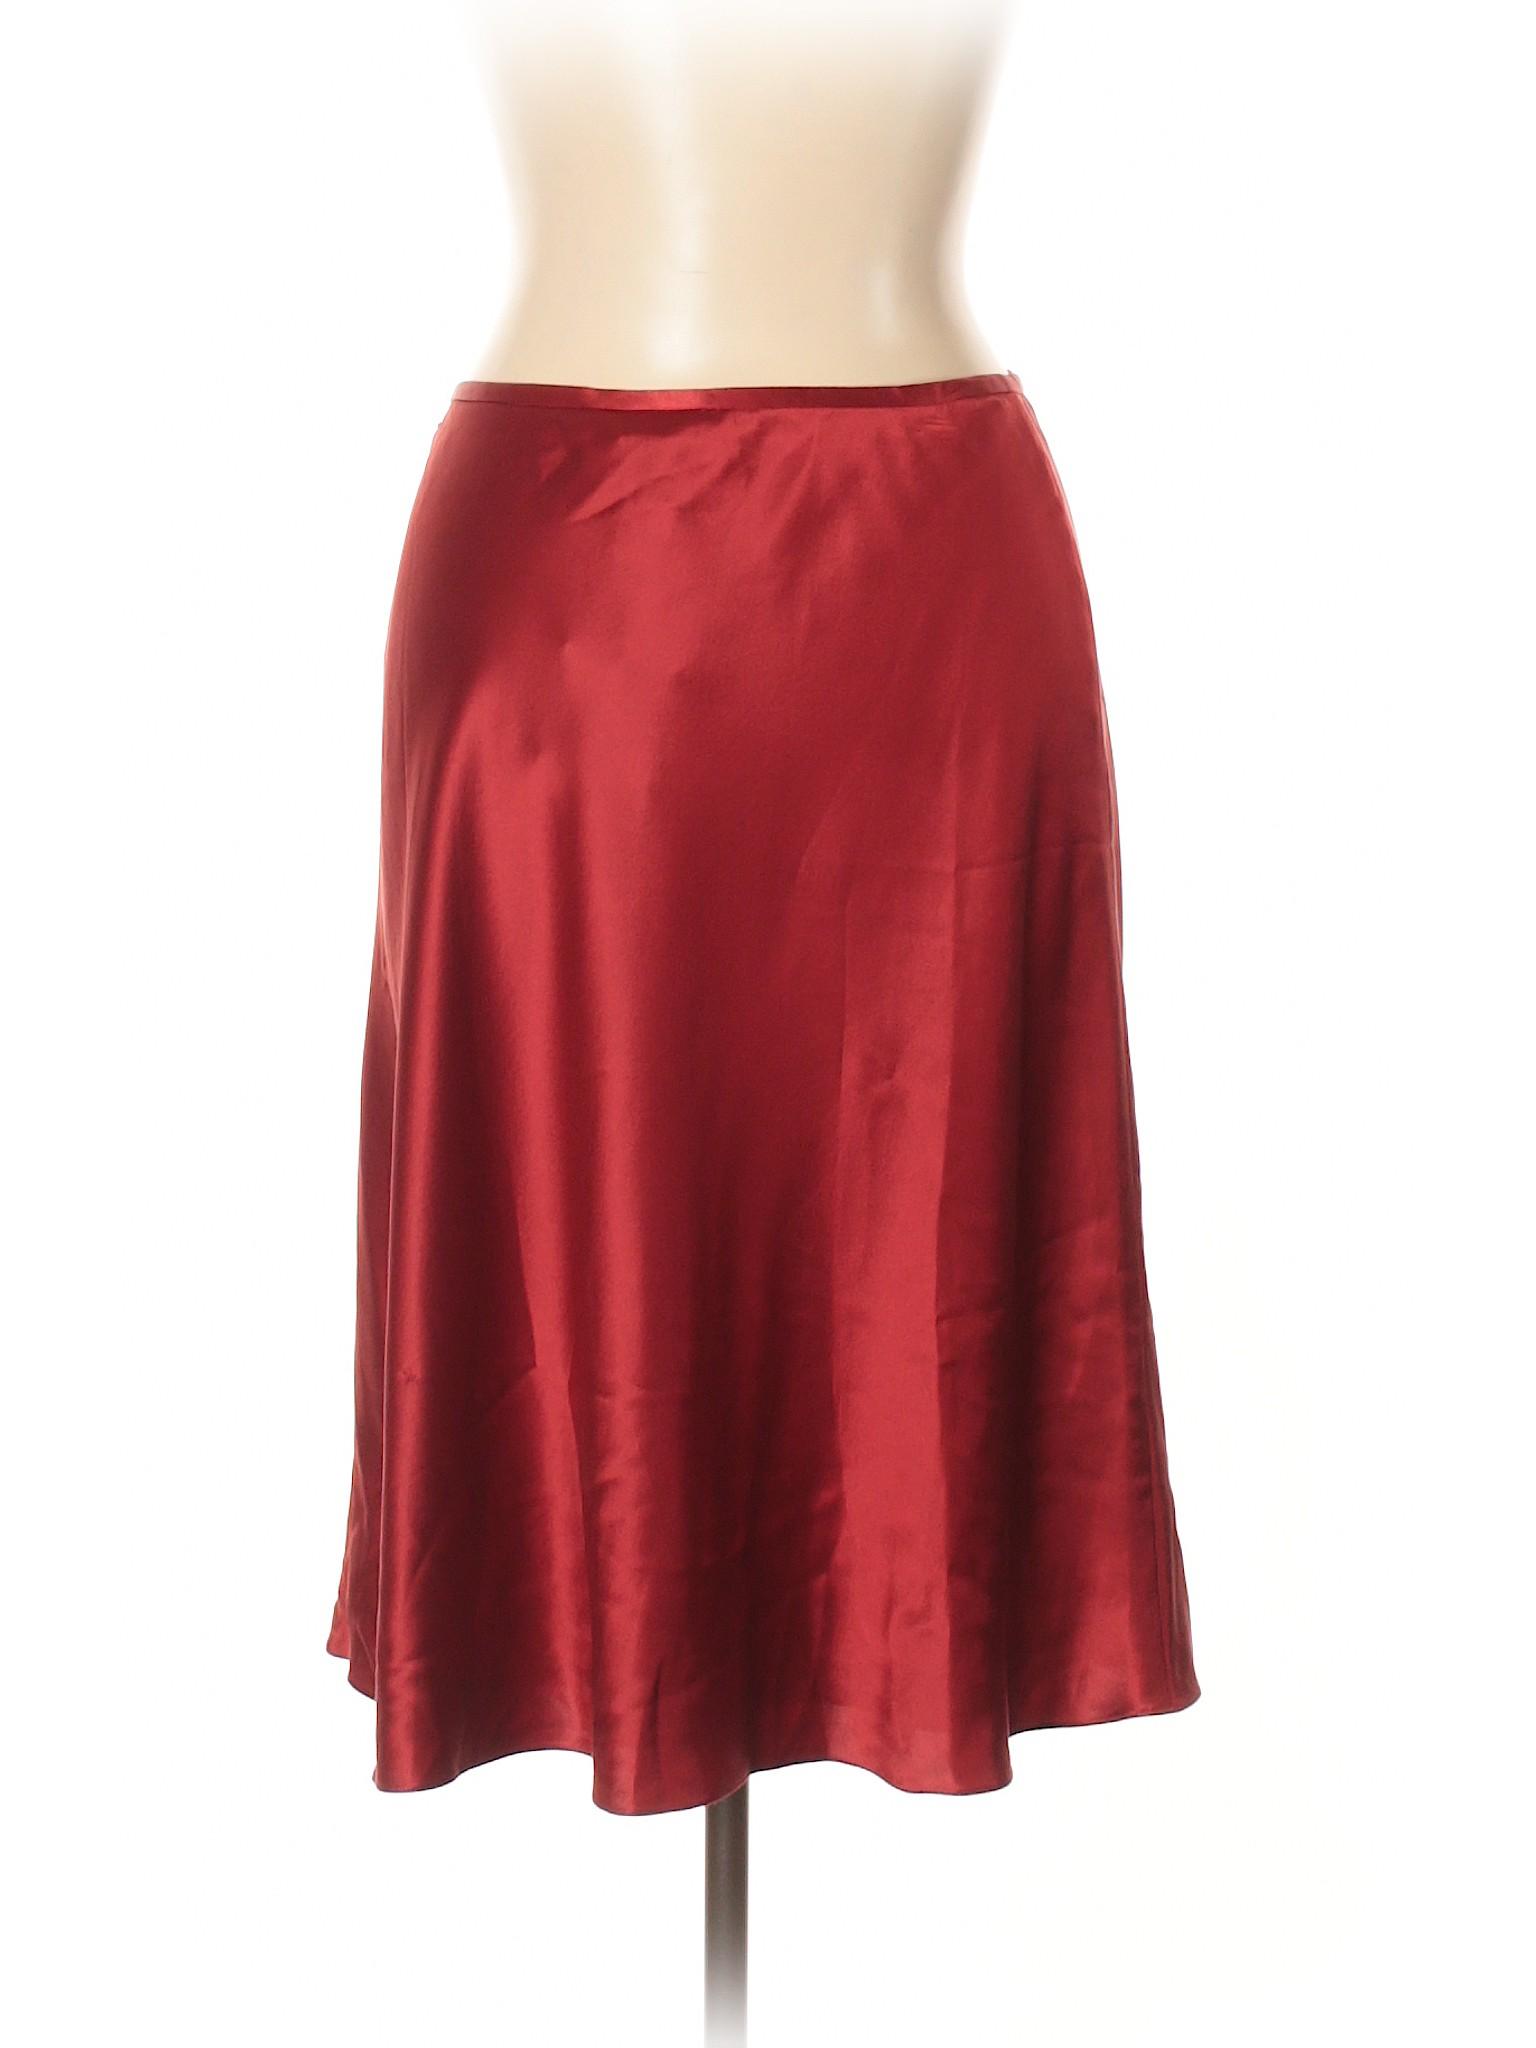 Skirt by Ralph Lauren Boutique Silk Lauren PTwfgf